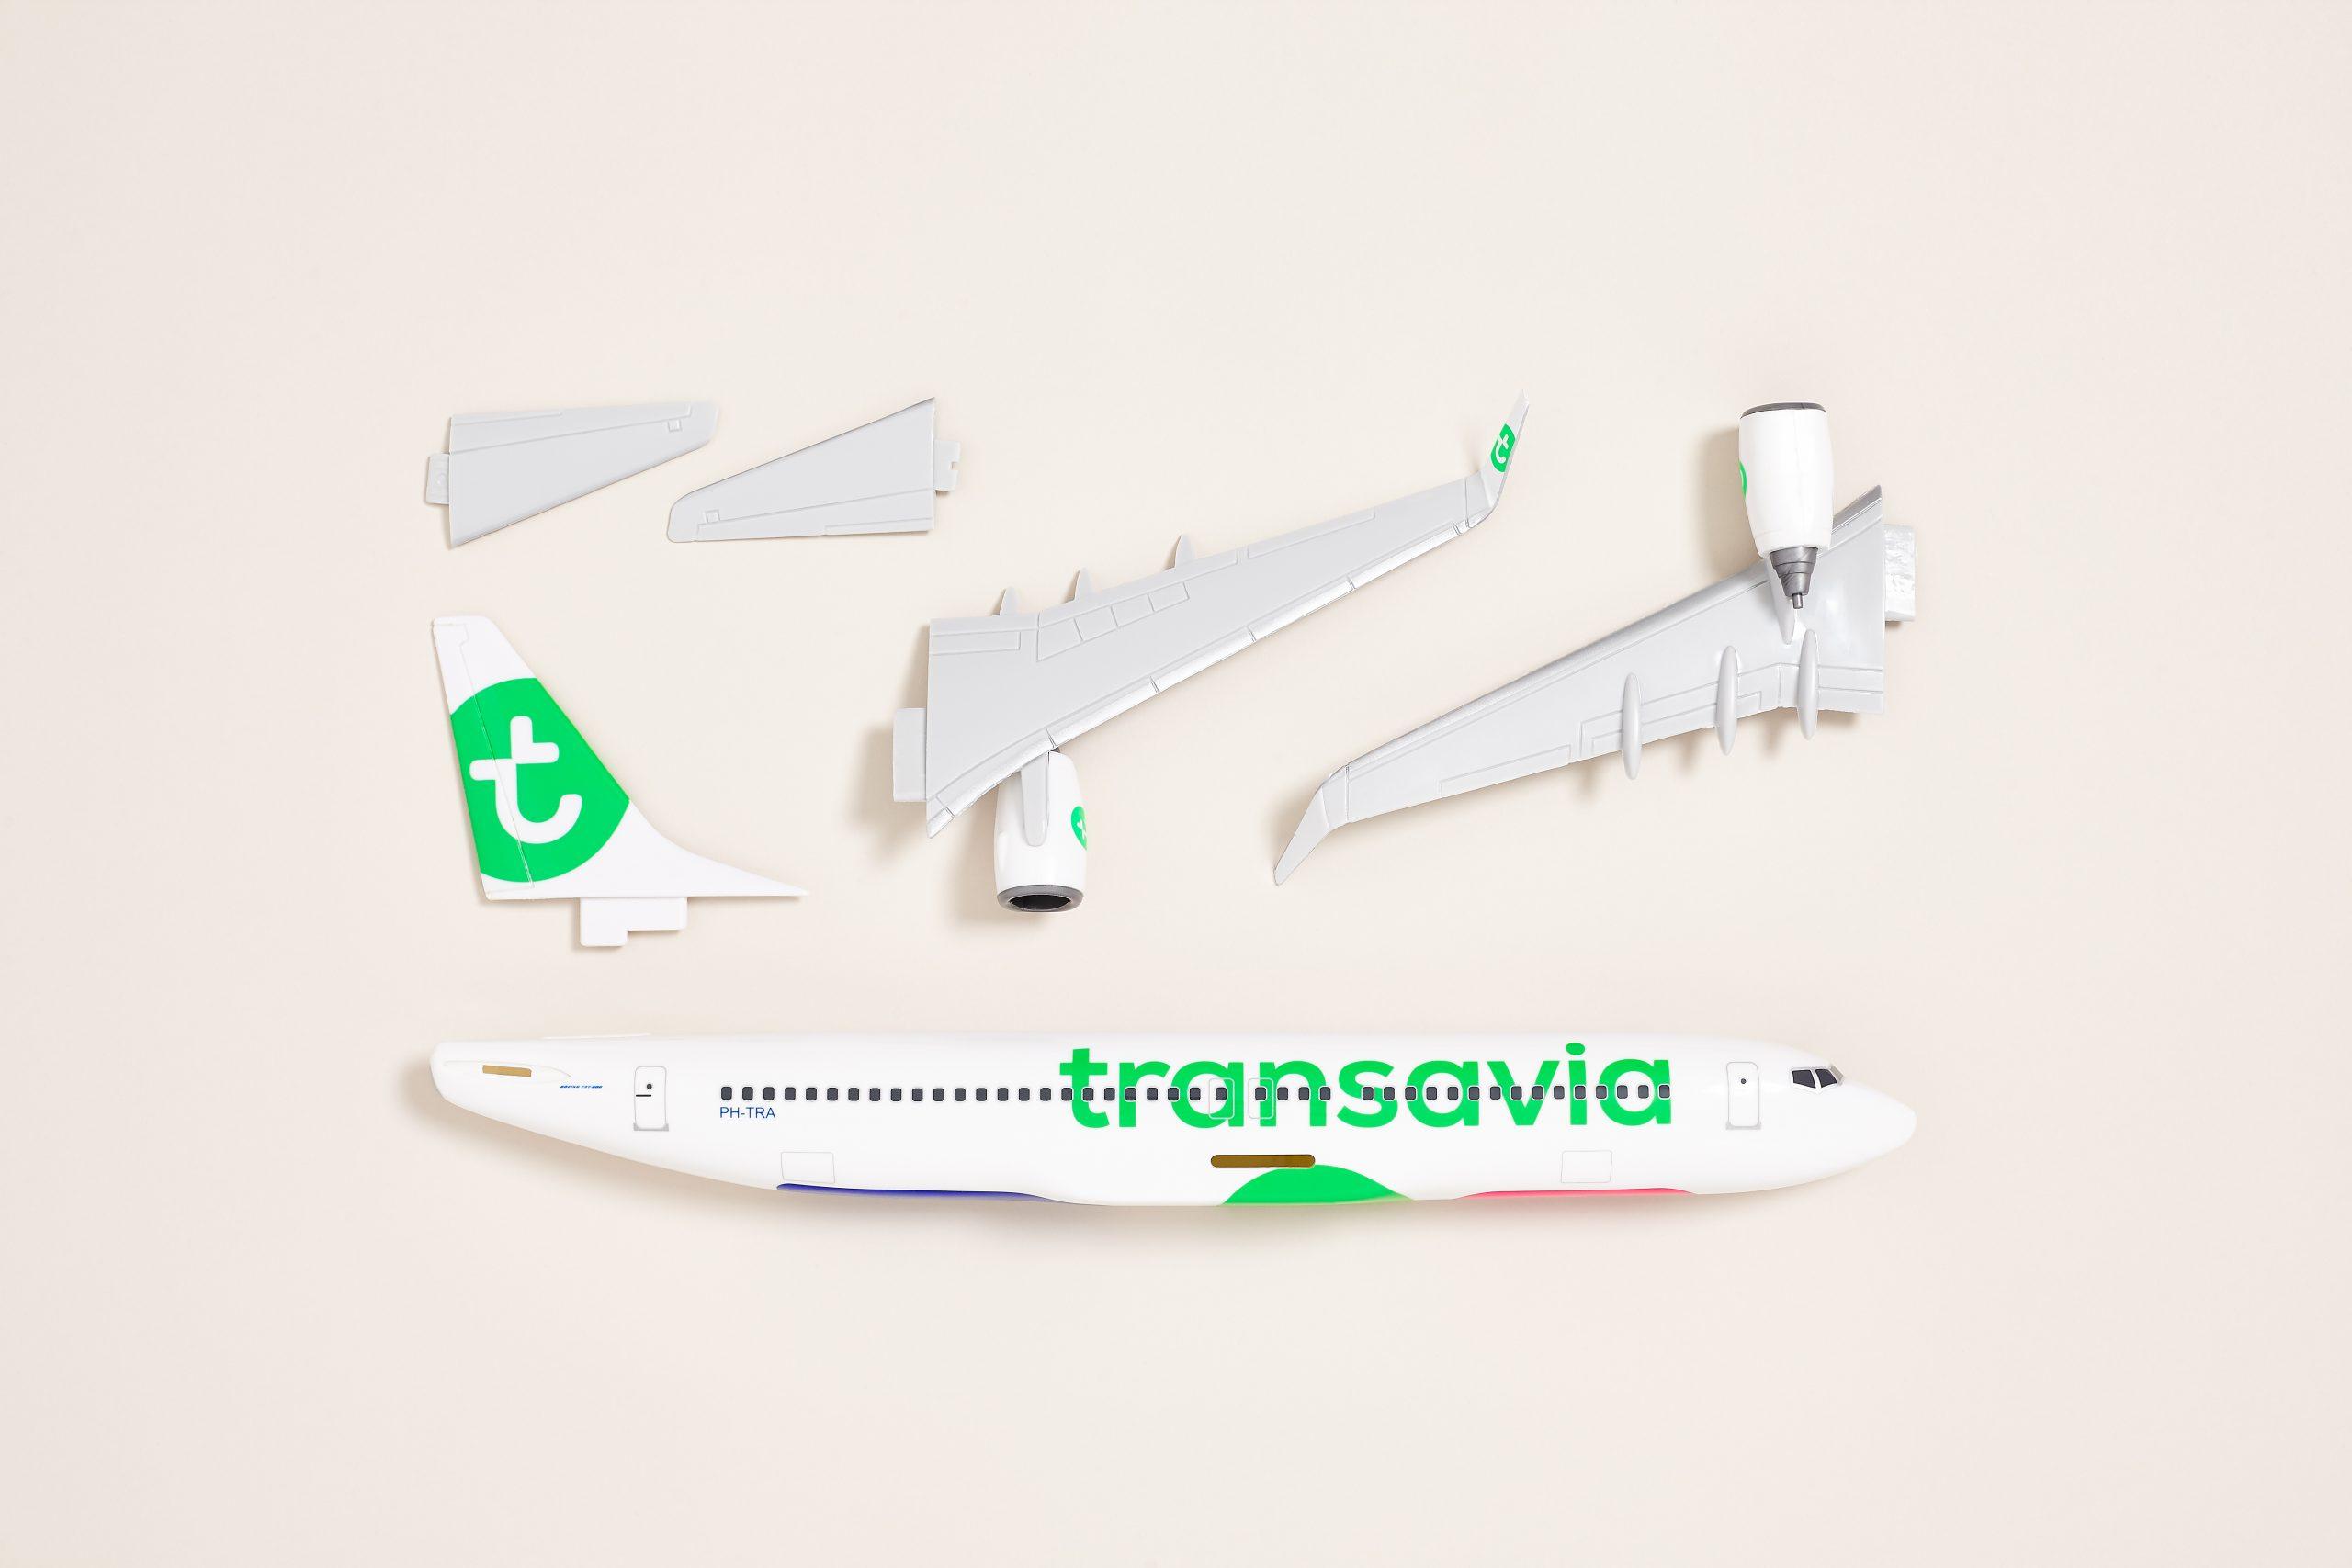 RGB 21 Transavia Airplane Model 3 scaled